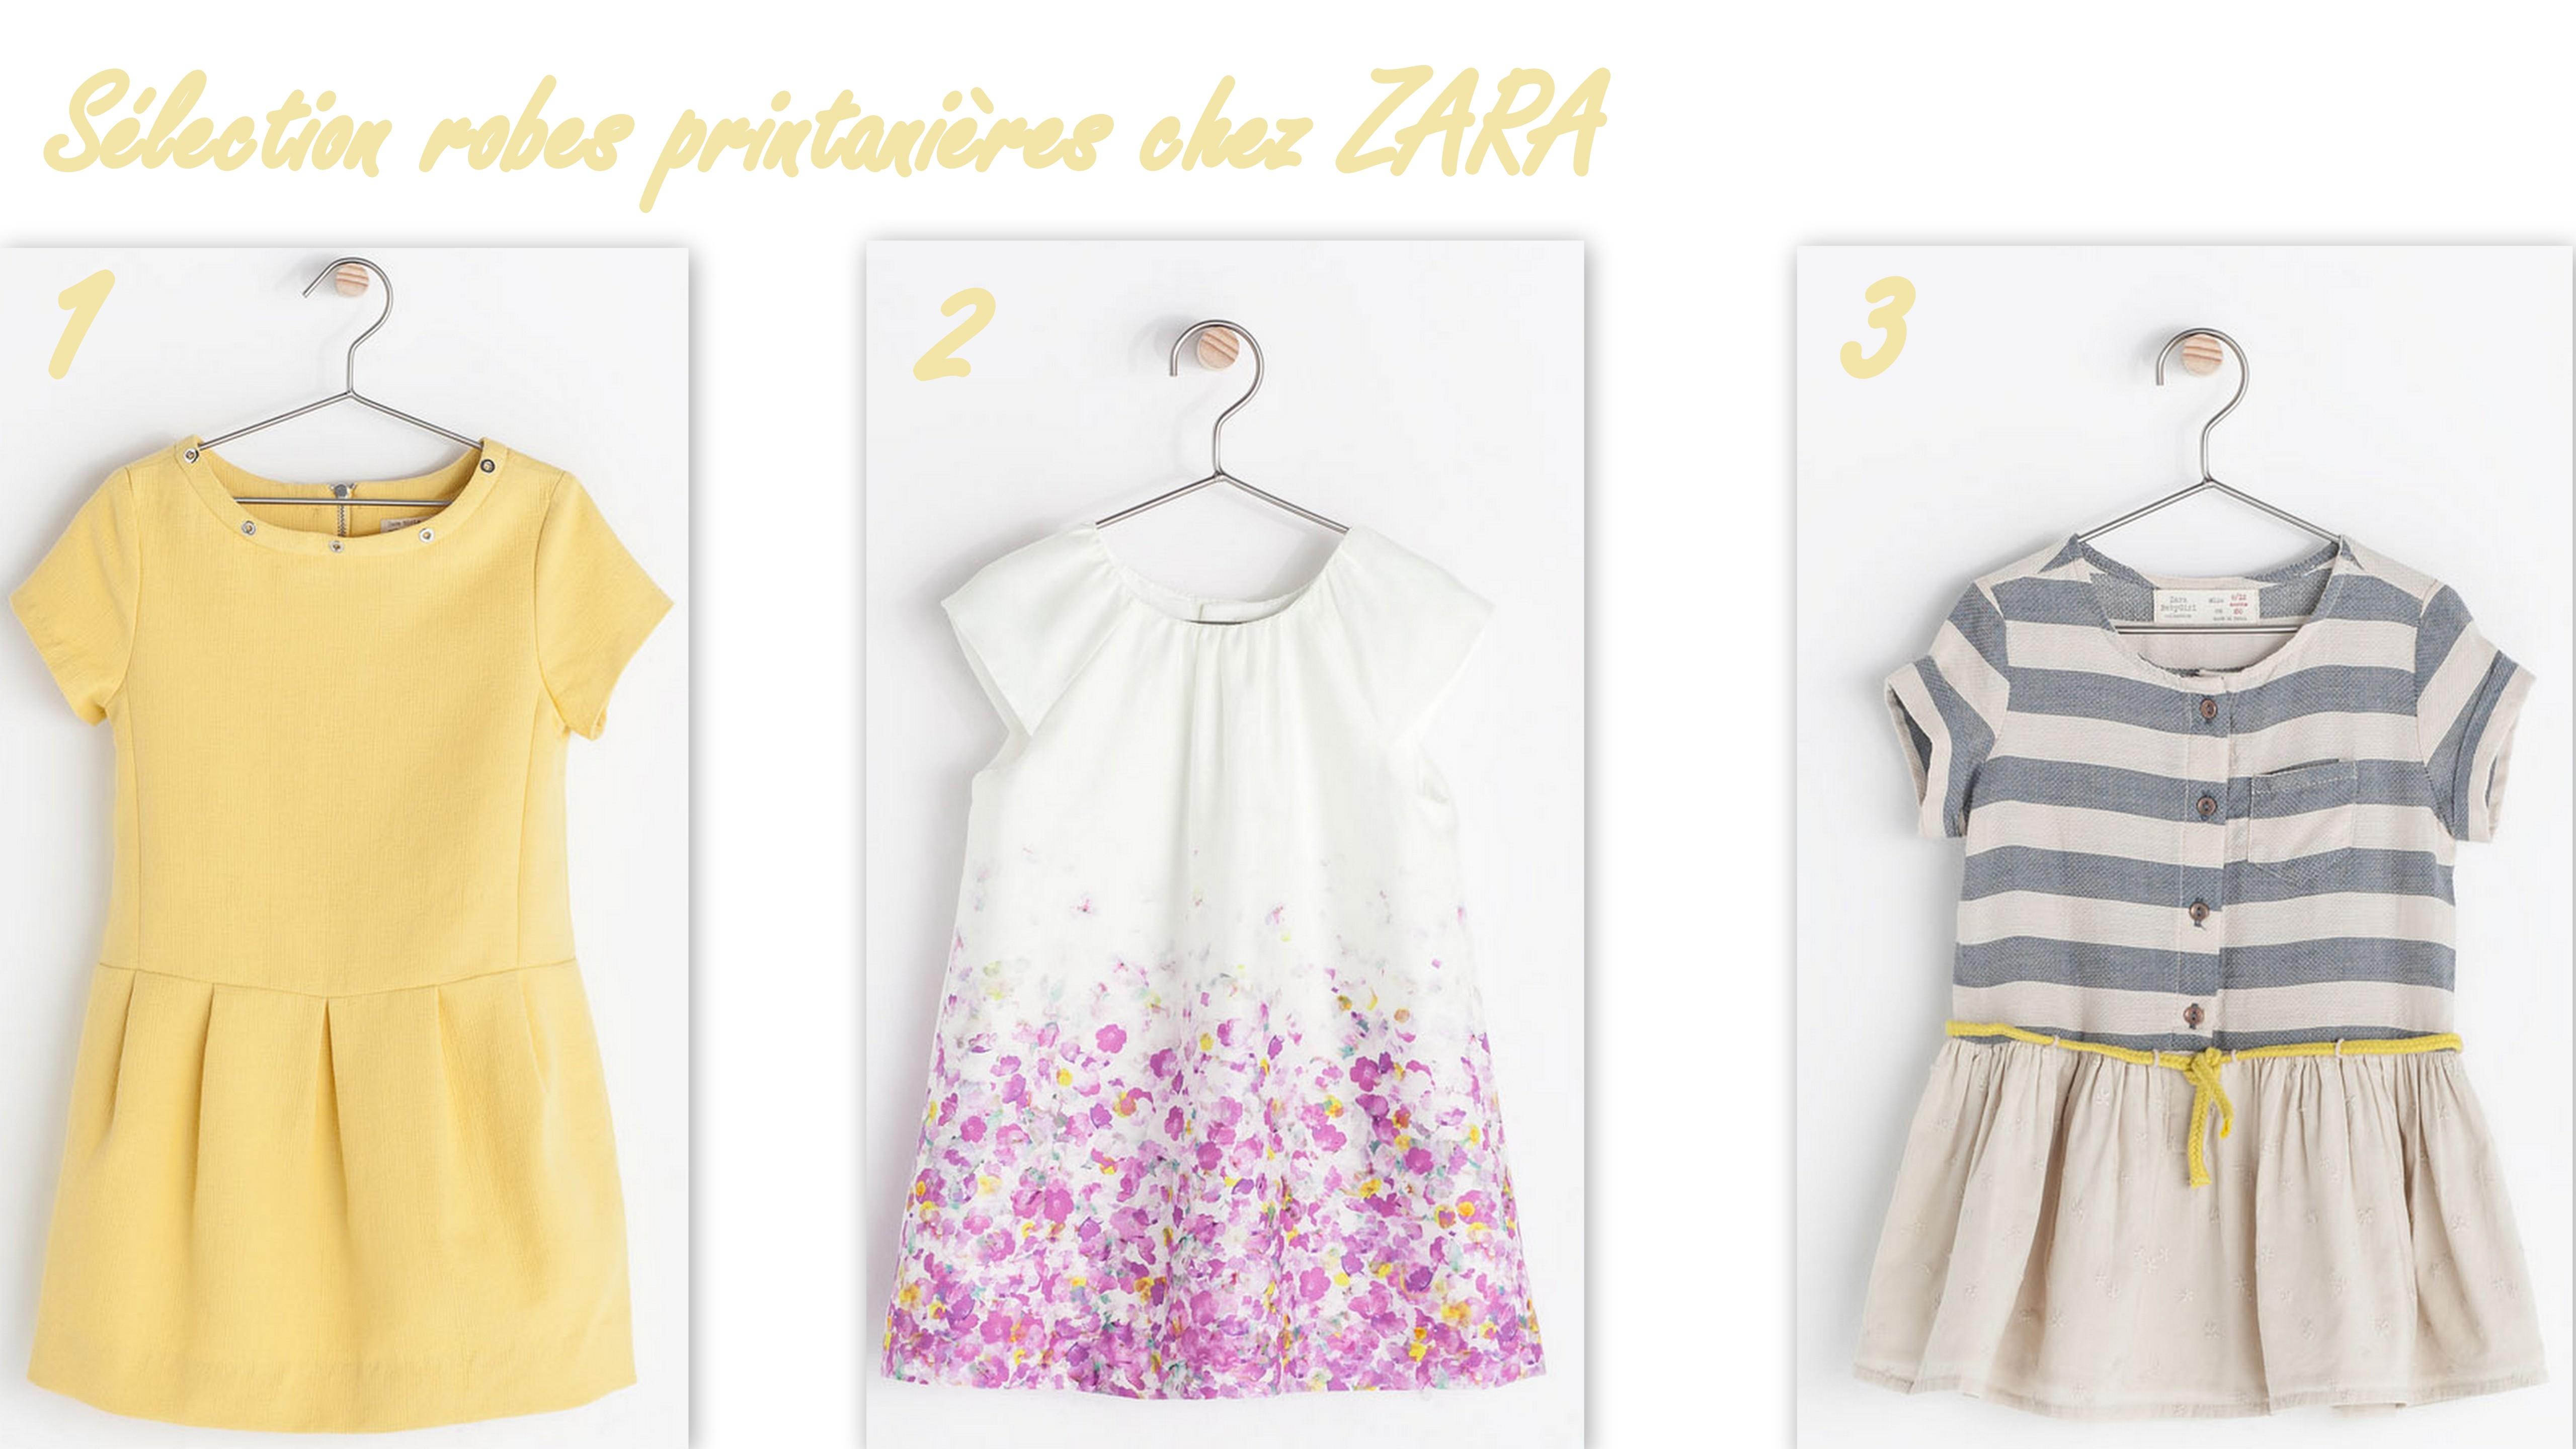 – Robes Printanières Demoiz'elle Mode} Vivi Kids Sélection shrQxotCBd